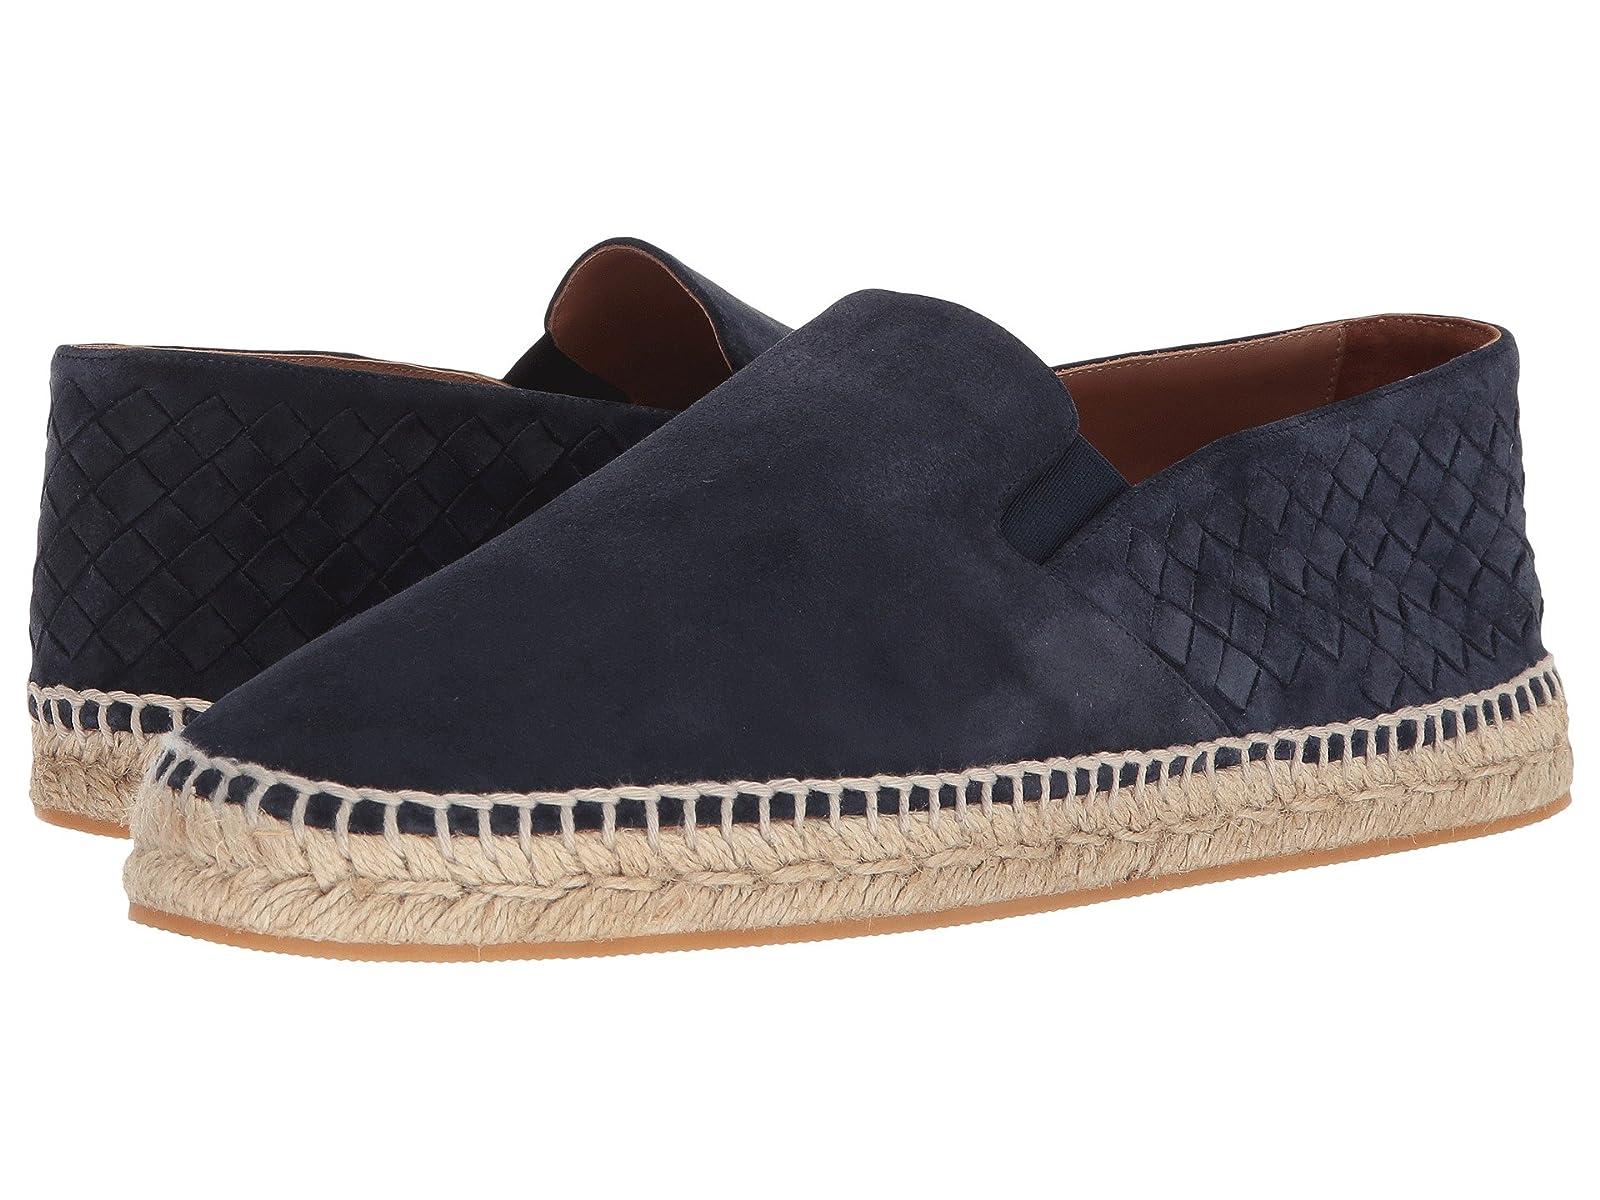 Bottega Veneta Sardana EspadrilleAtmospheric grades have affordable shoes